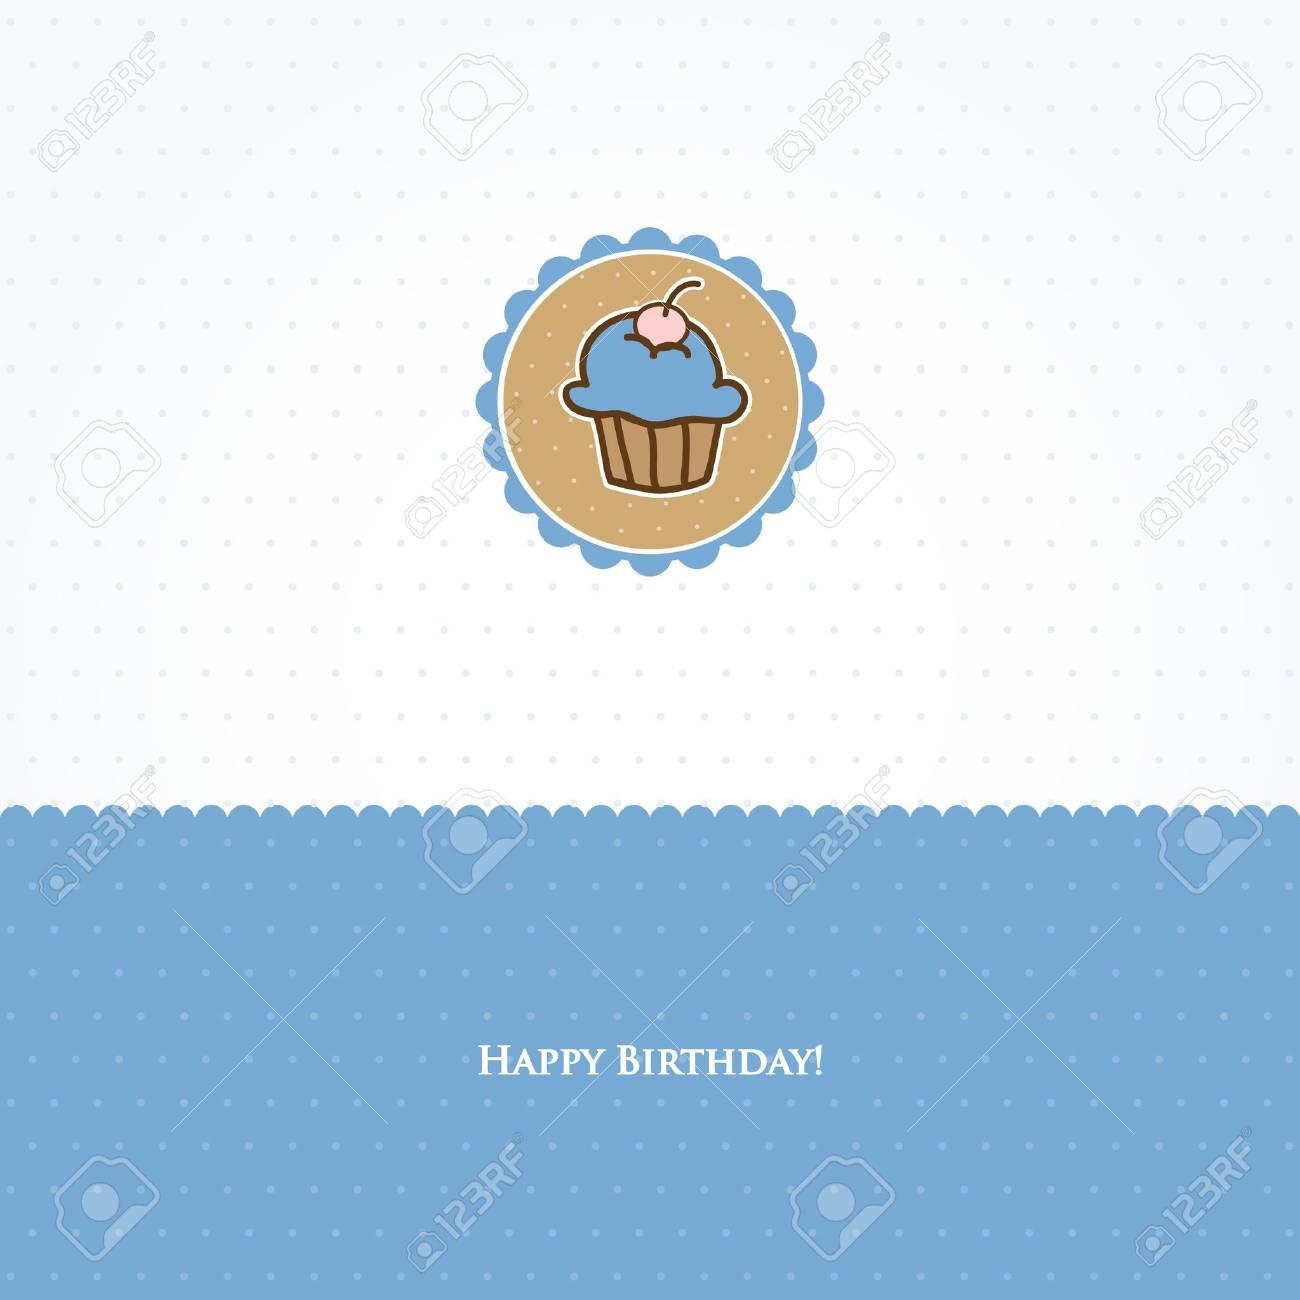 Birthday card with cute cupcake Stock Photo - 10324976